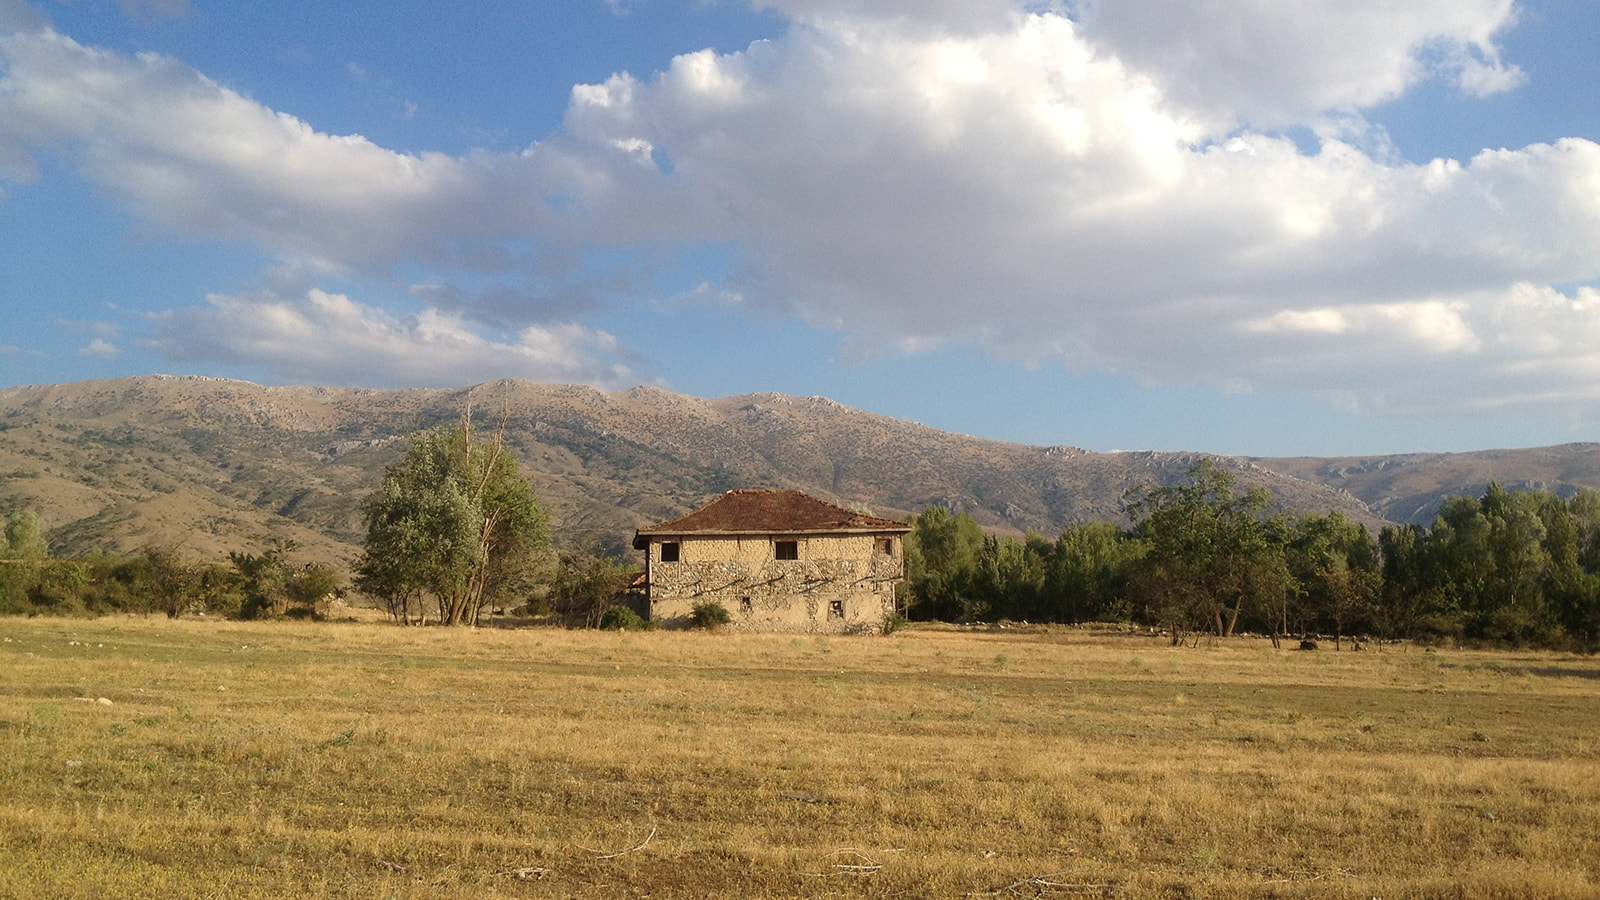 Guy-Stagg-The-Crossway-Anatolian-Plateau